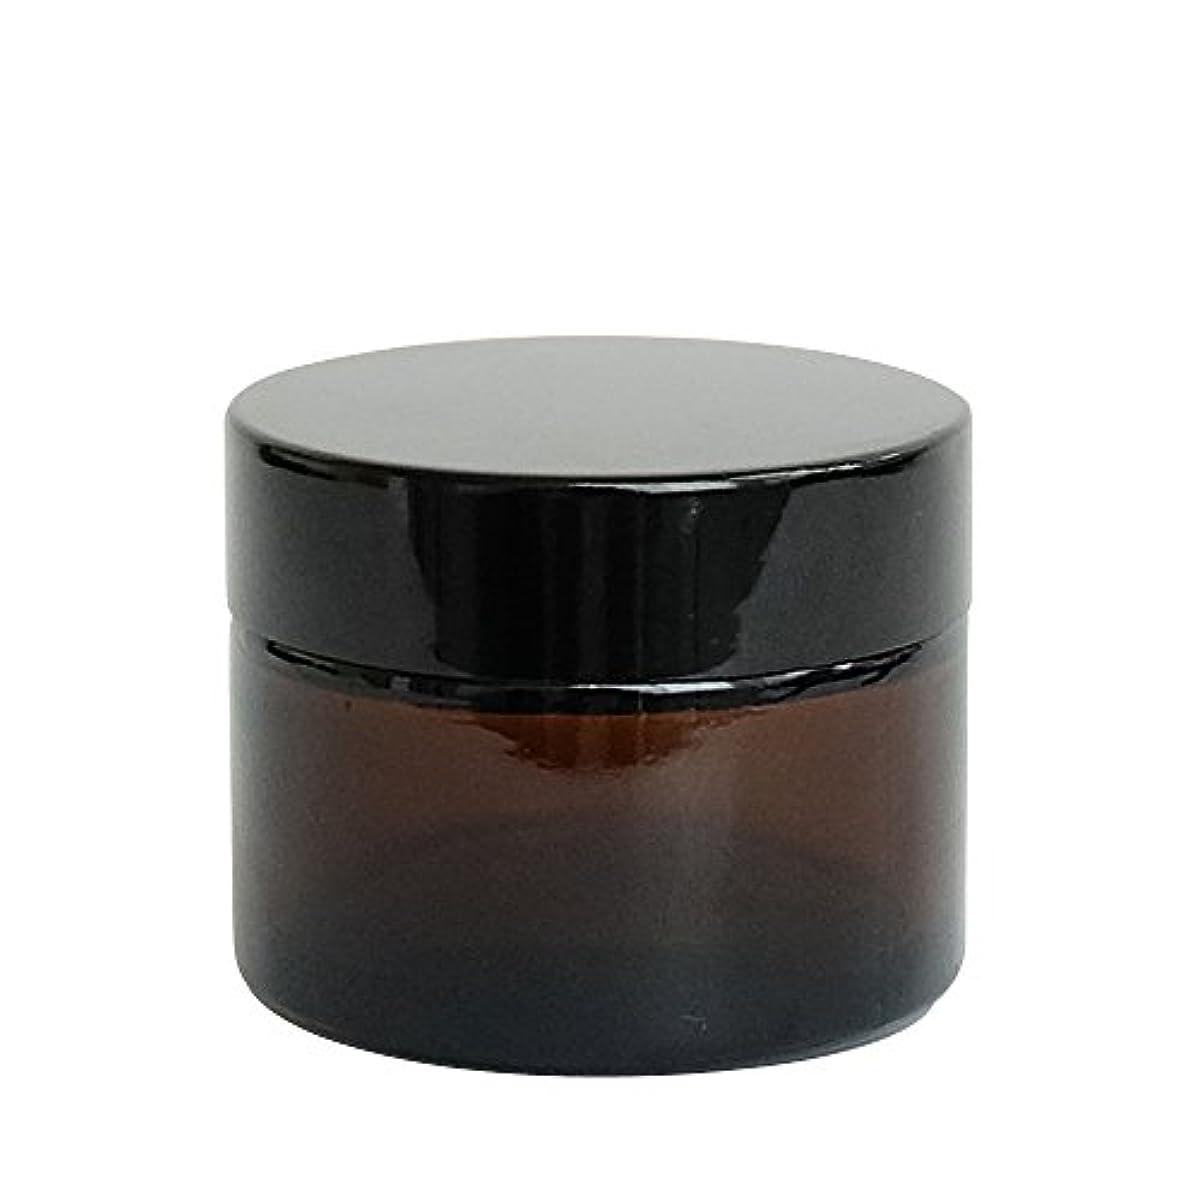 幽霊肥料故国ease 遮光ジャー 茶色 50g用×30個